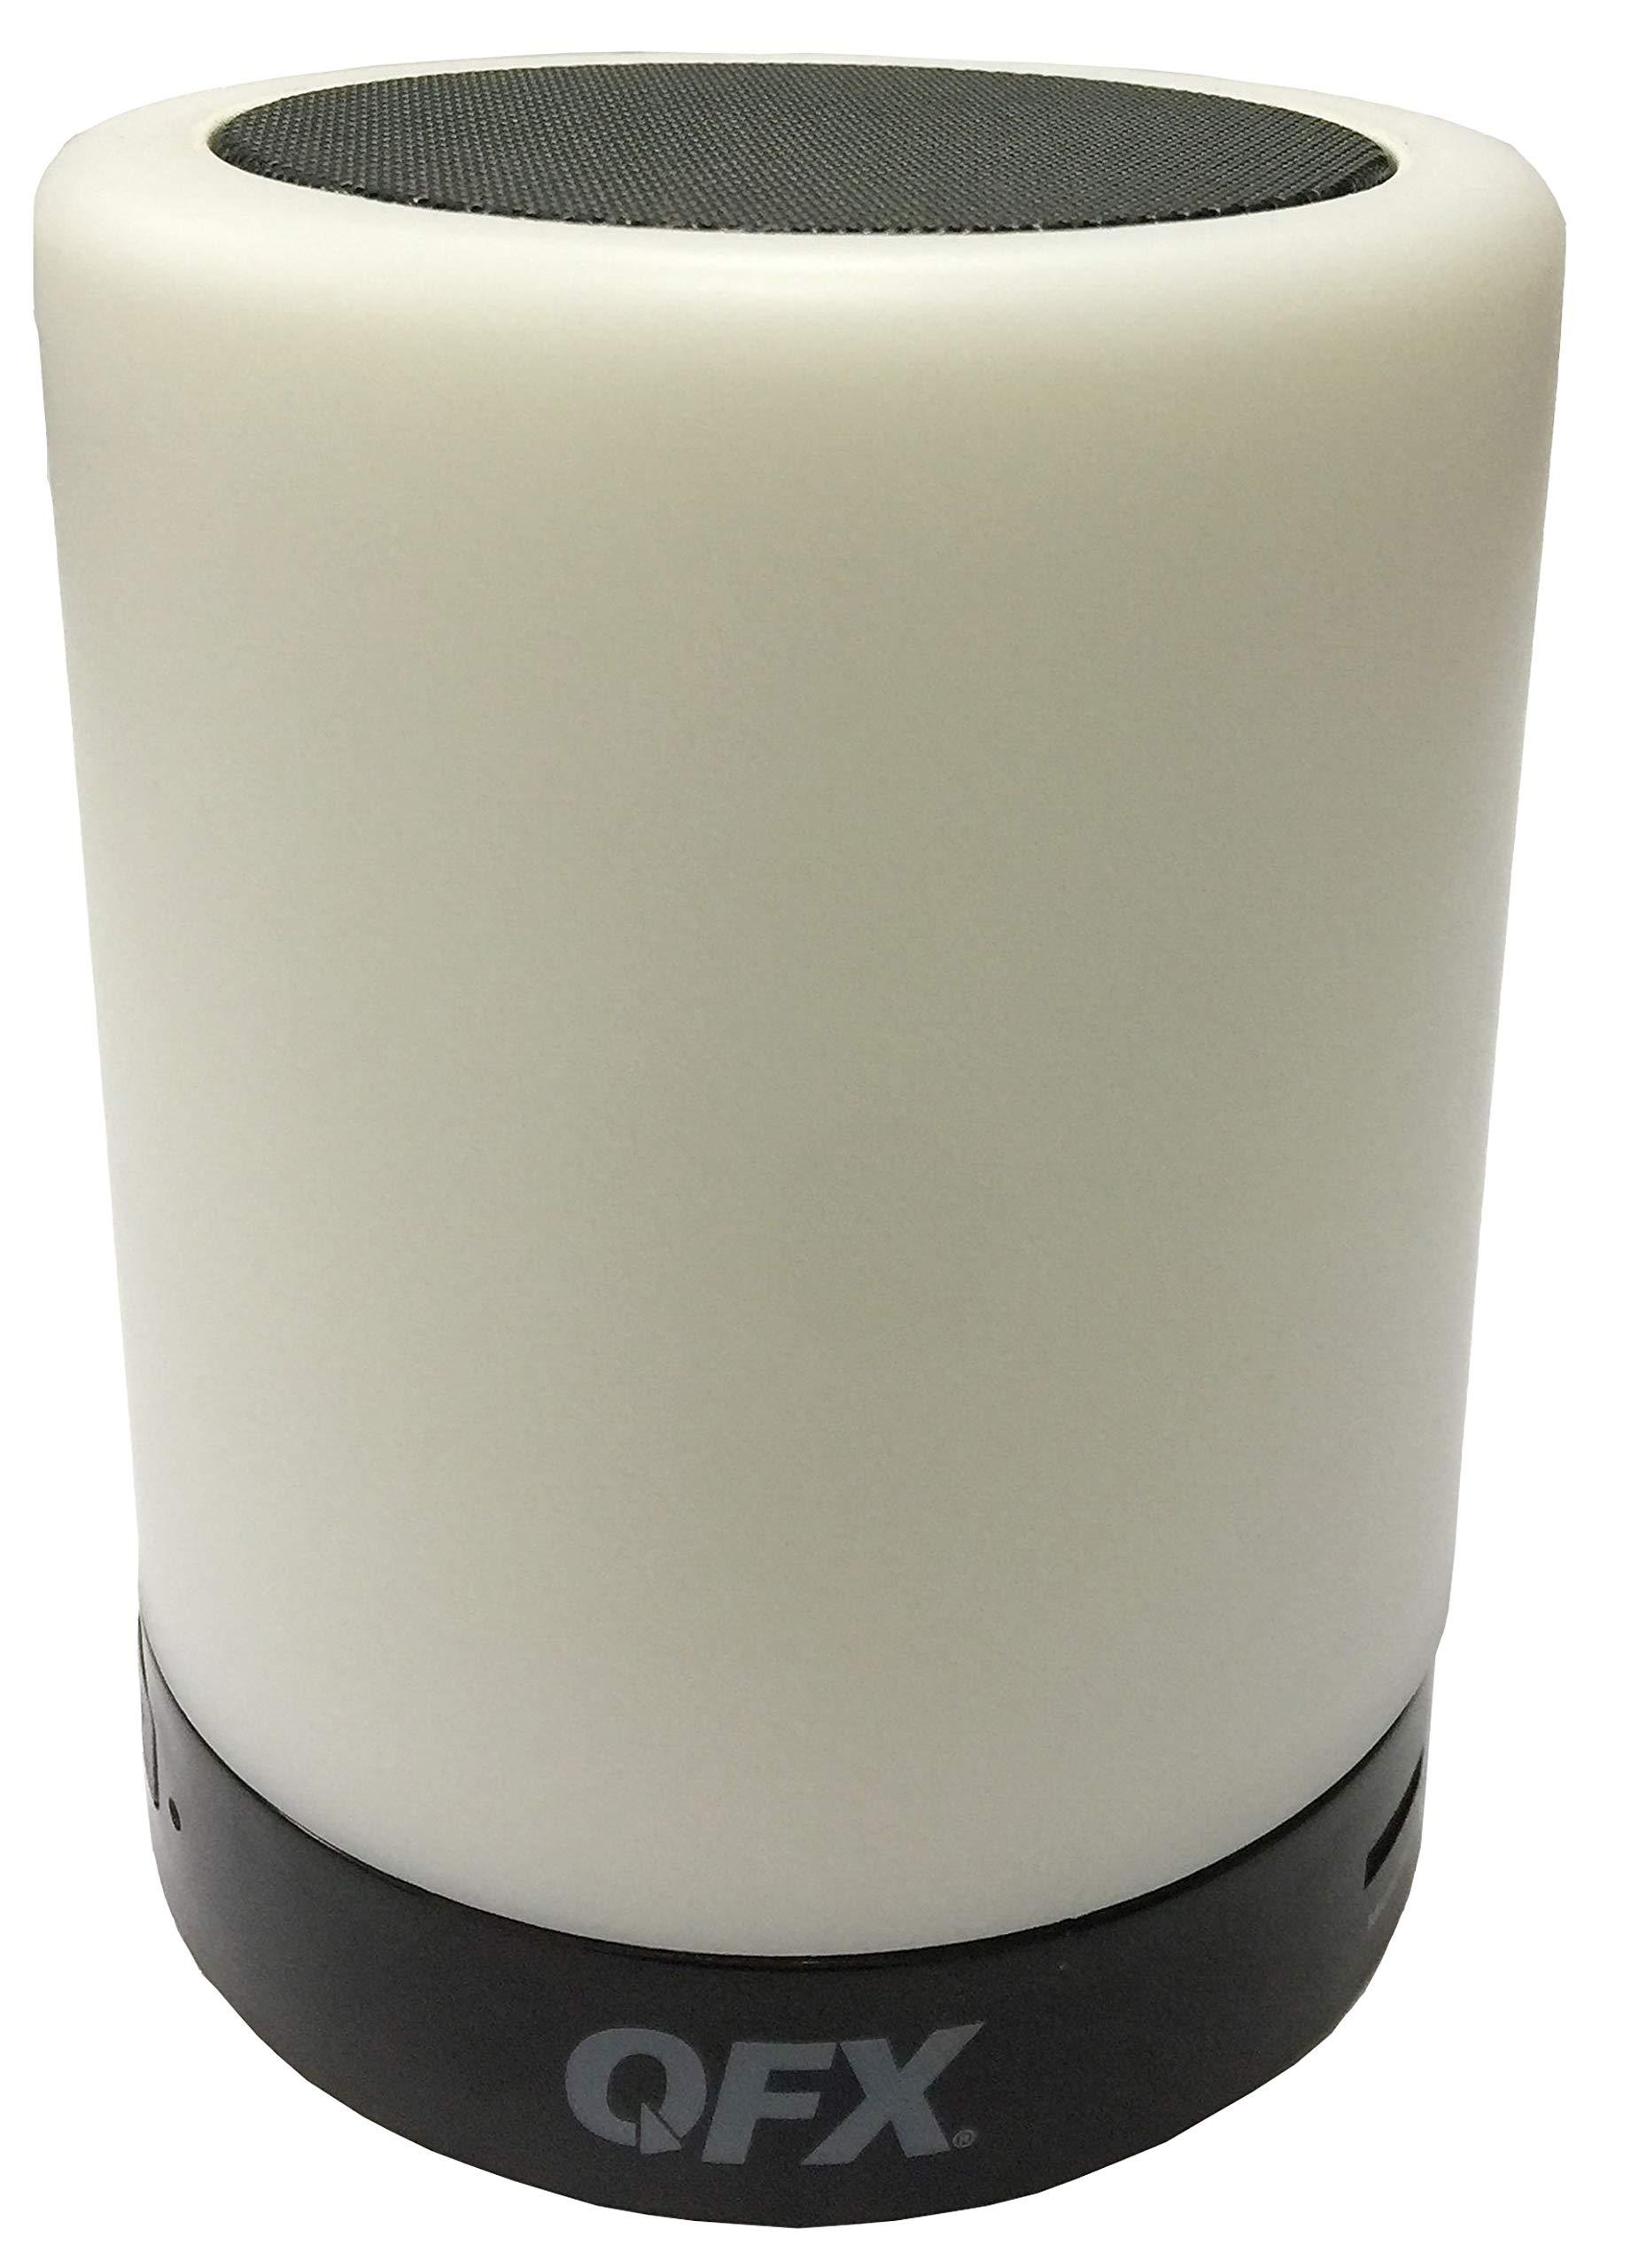 QFX E-200 Portable Multi-Room WiFi and Bluetooth Speaker